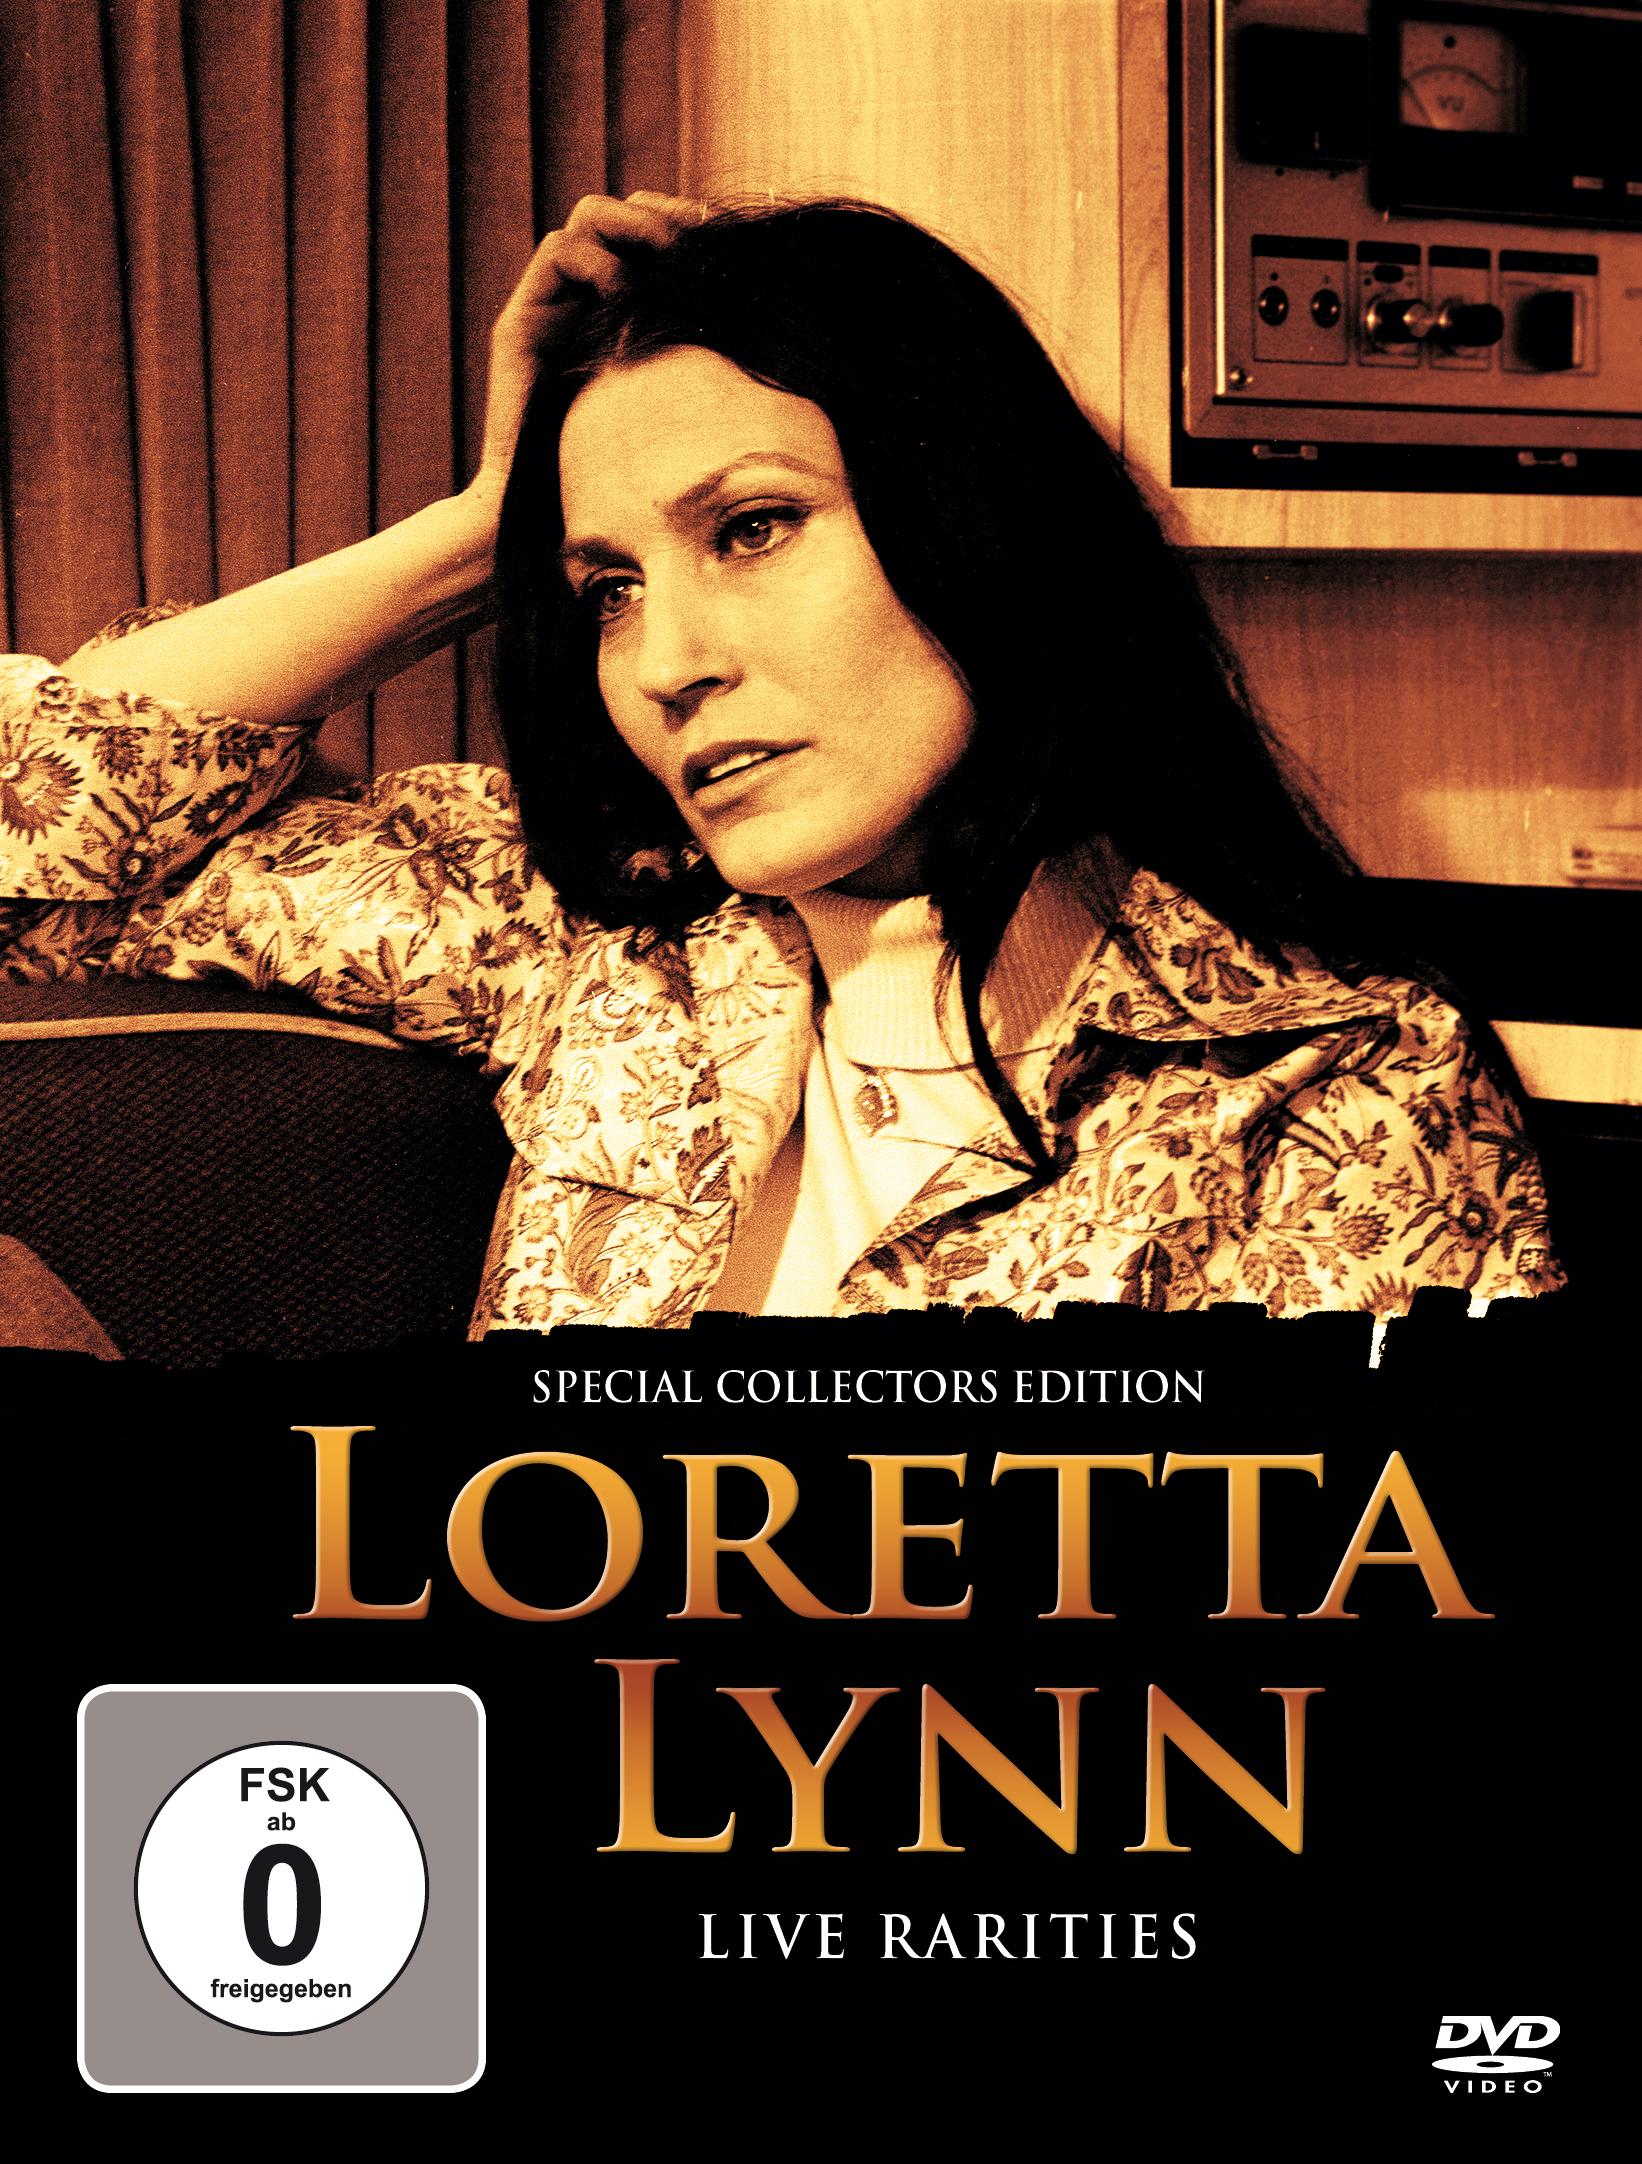 Loretta Lynn: Live Rarities